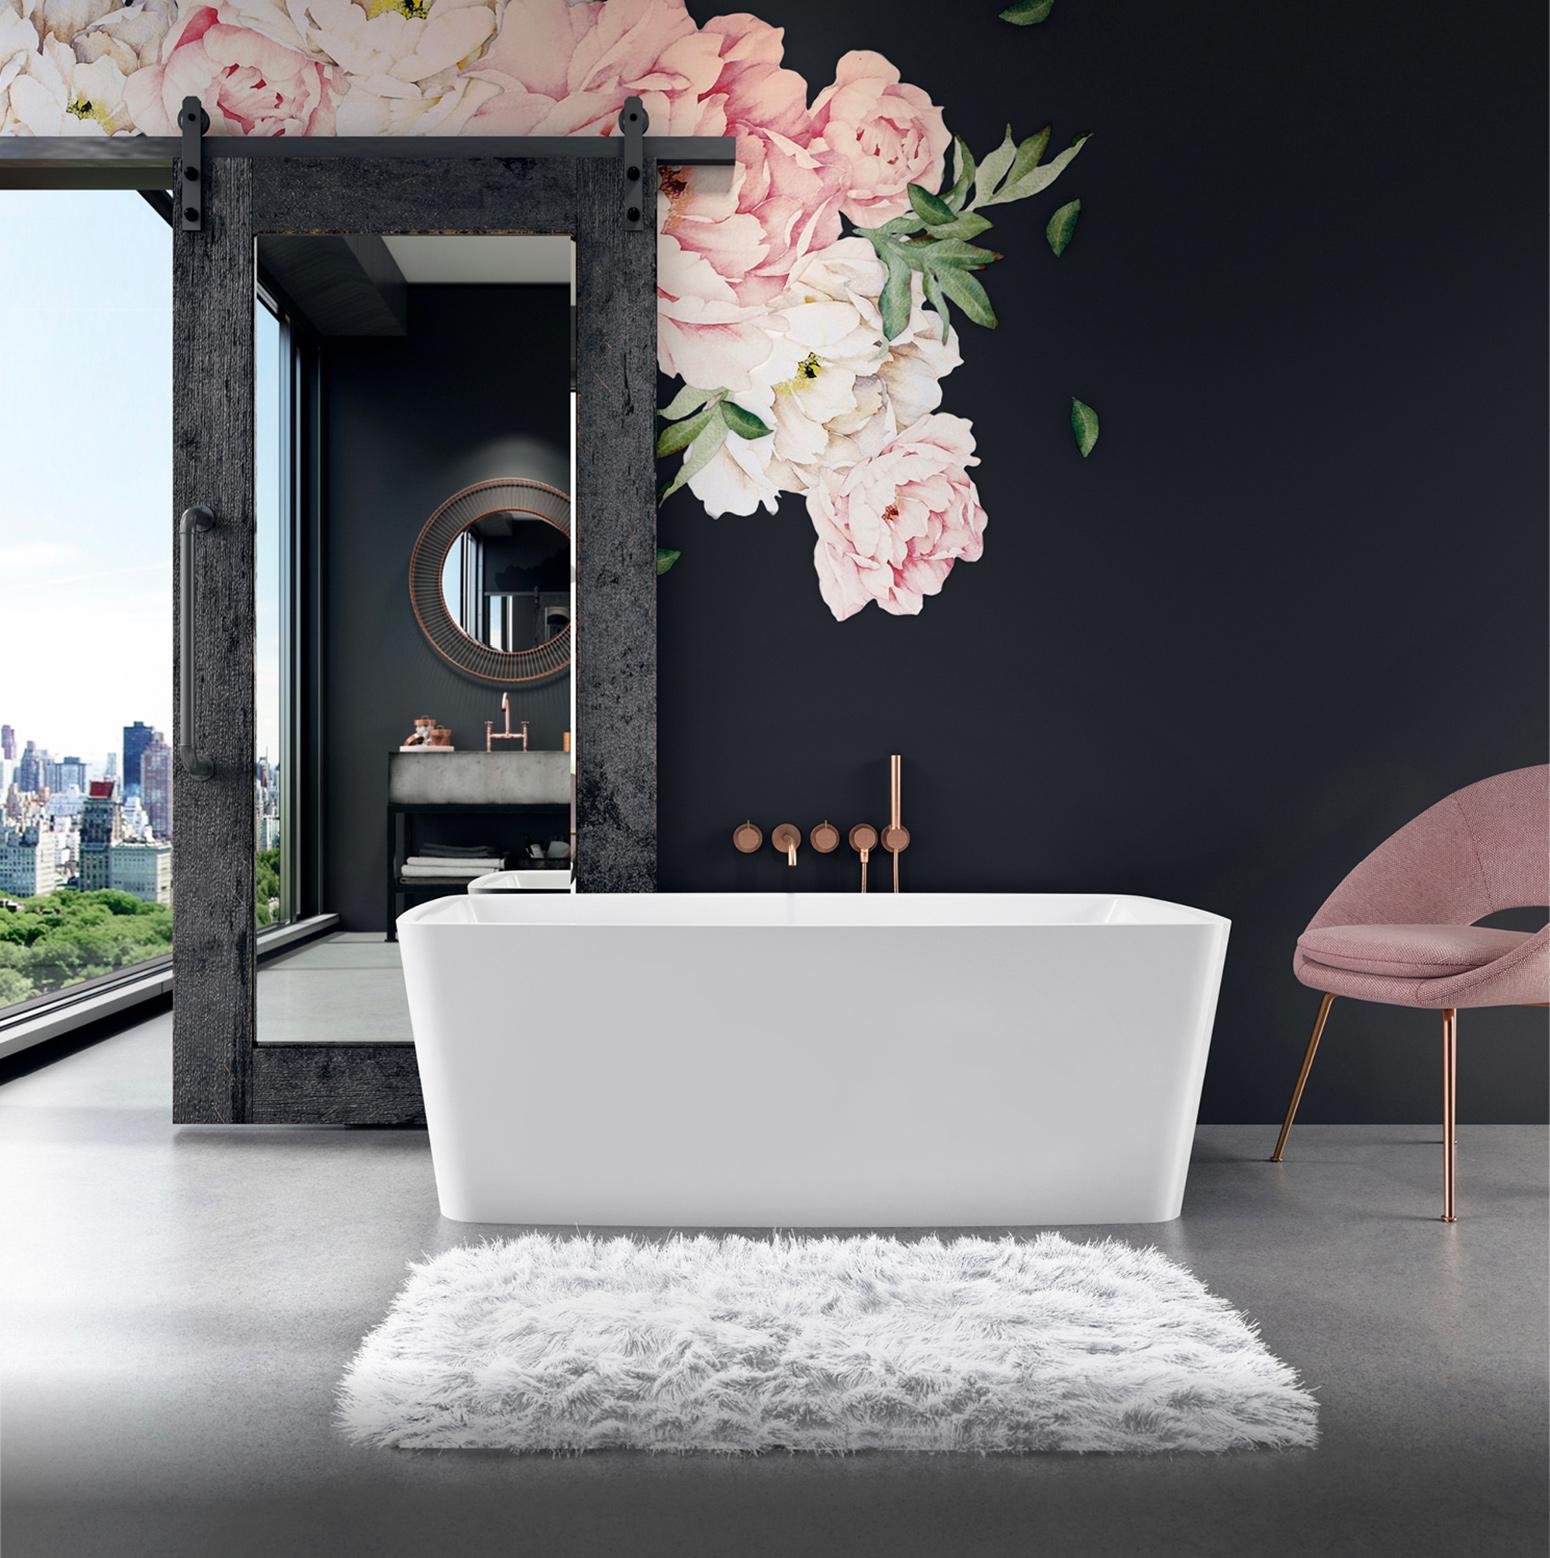 Bainultra Vibe® freestanding bathtub to match the perfect vibe